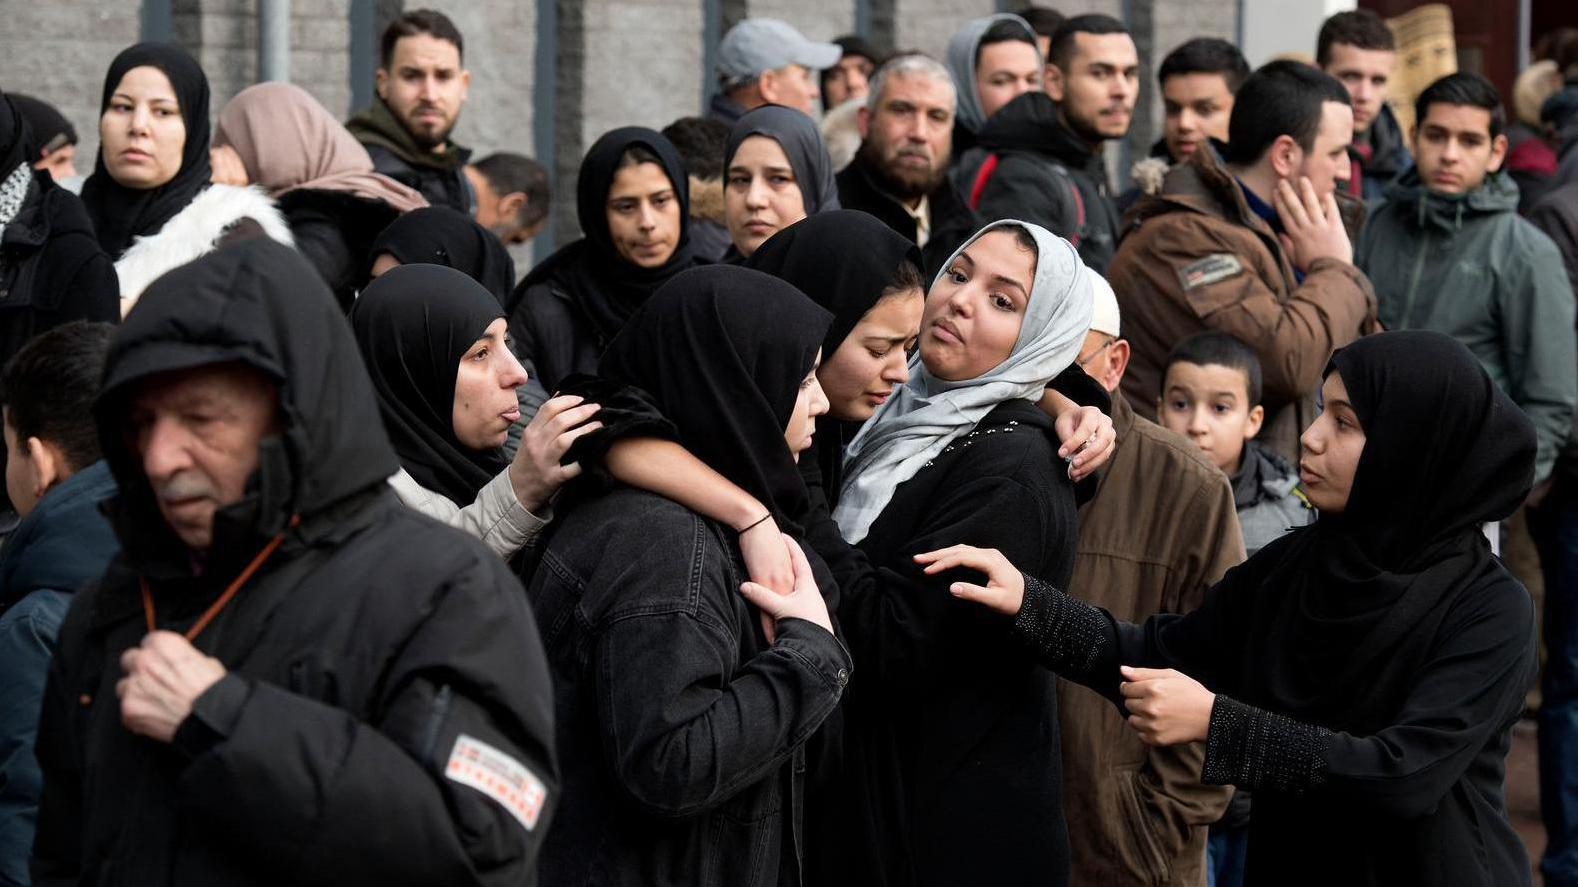 Mohammed vandaag begraven in Marokko